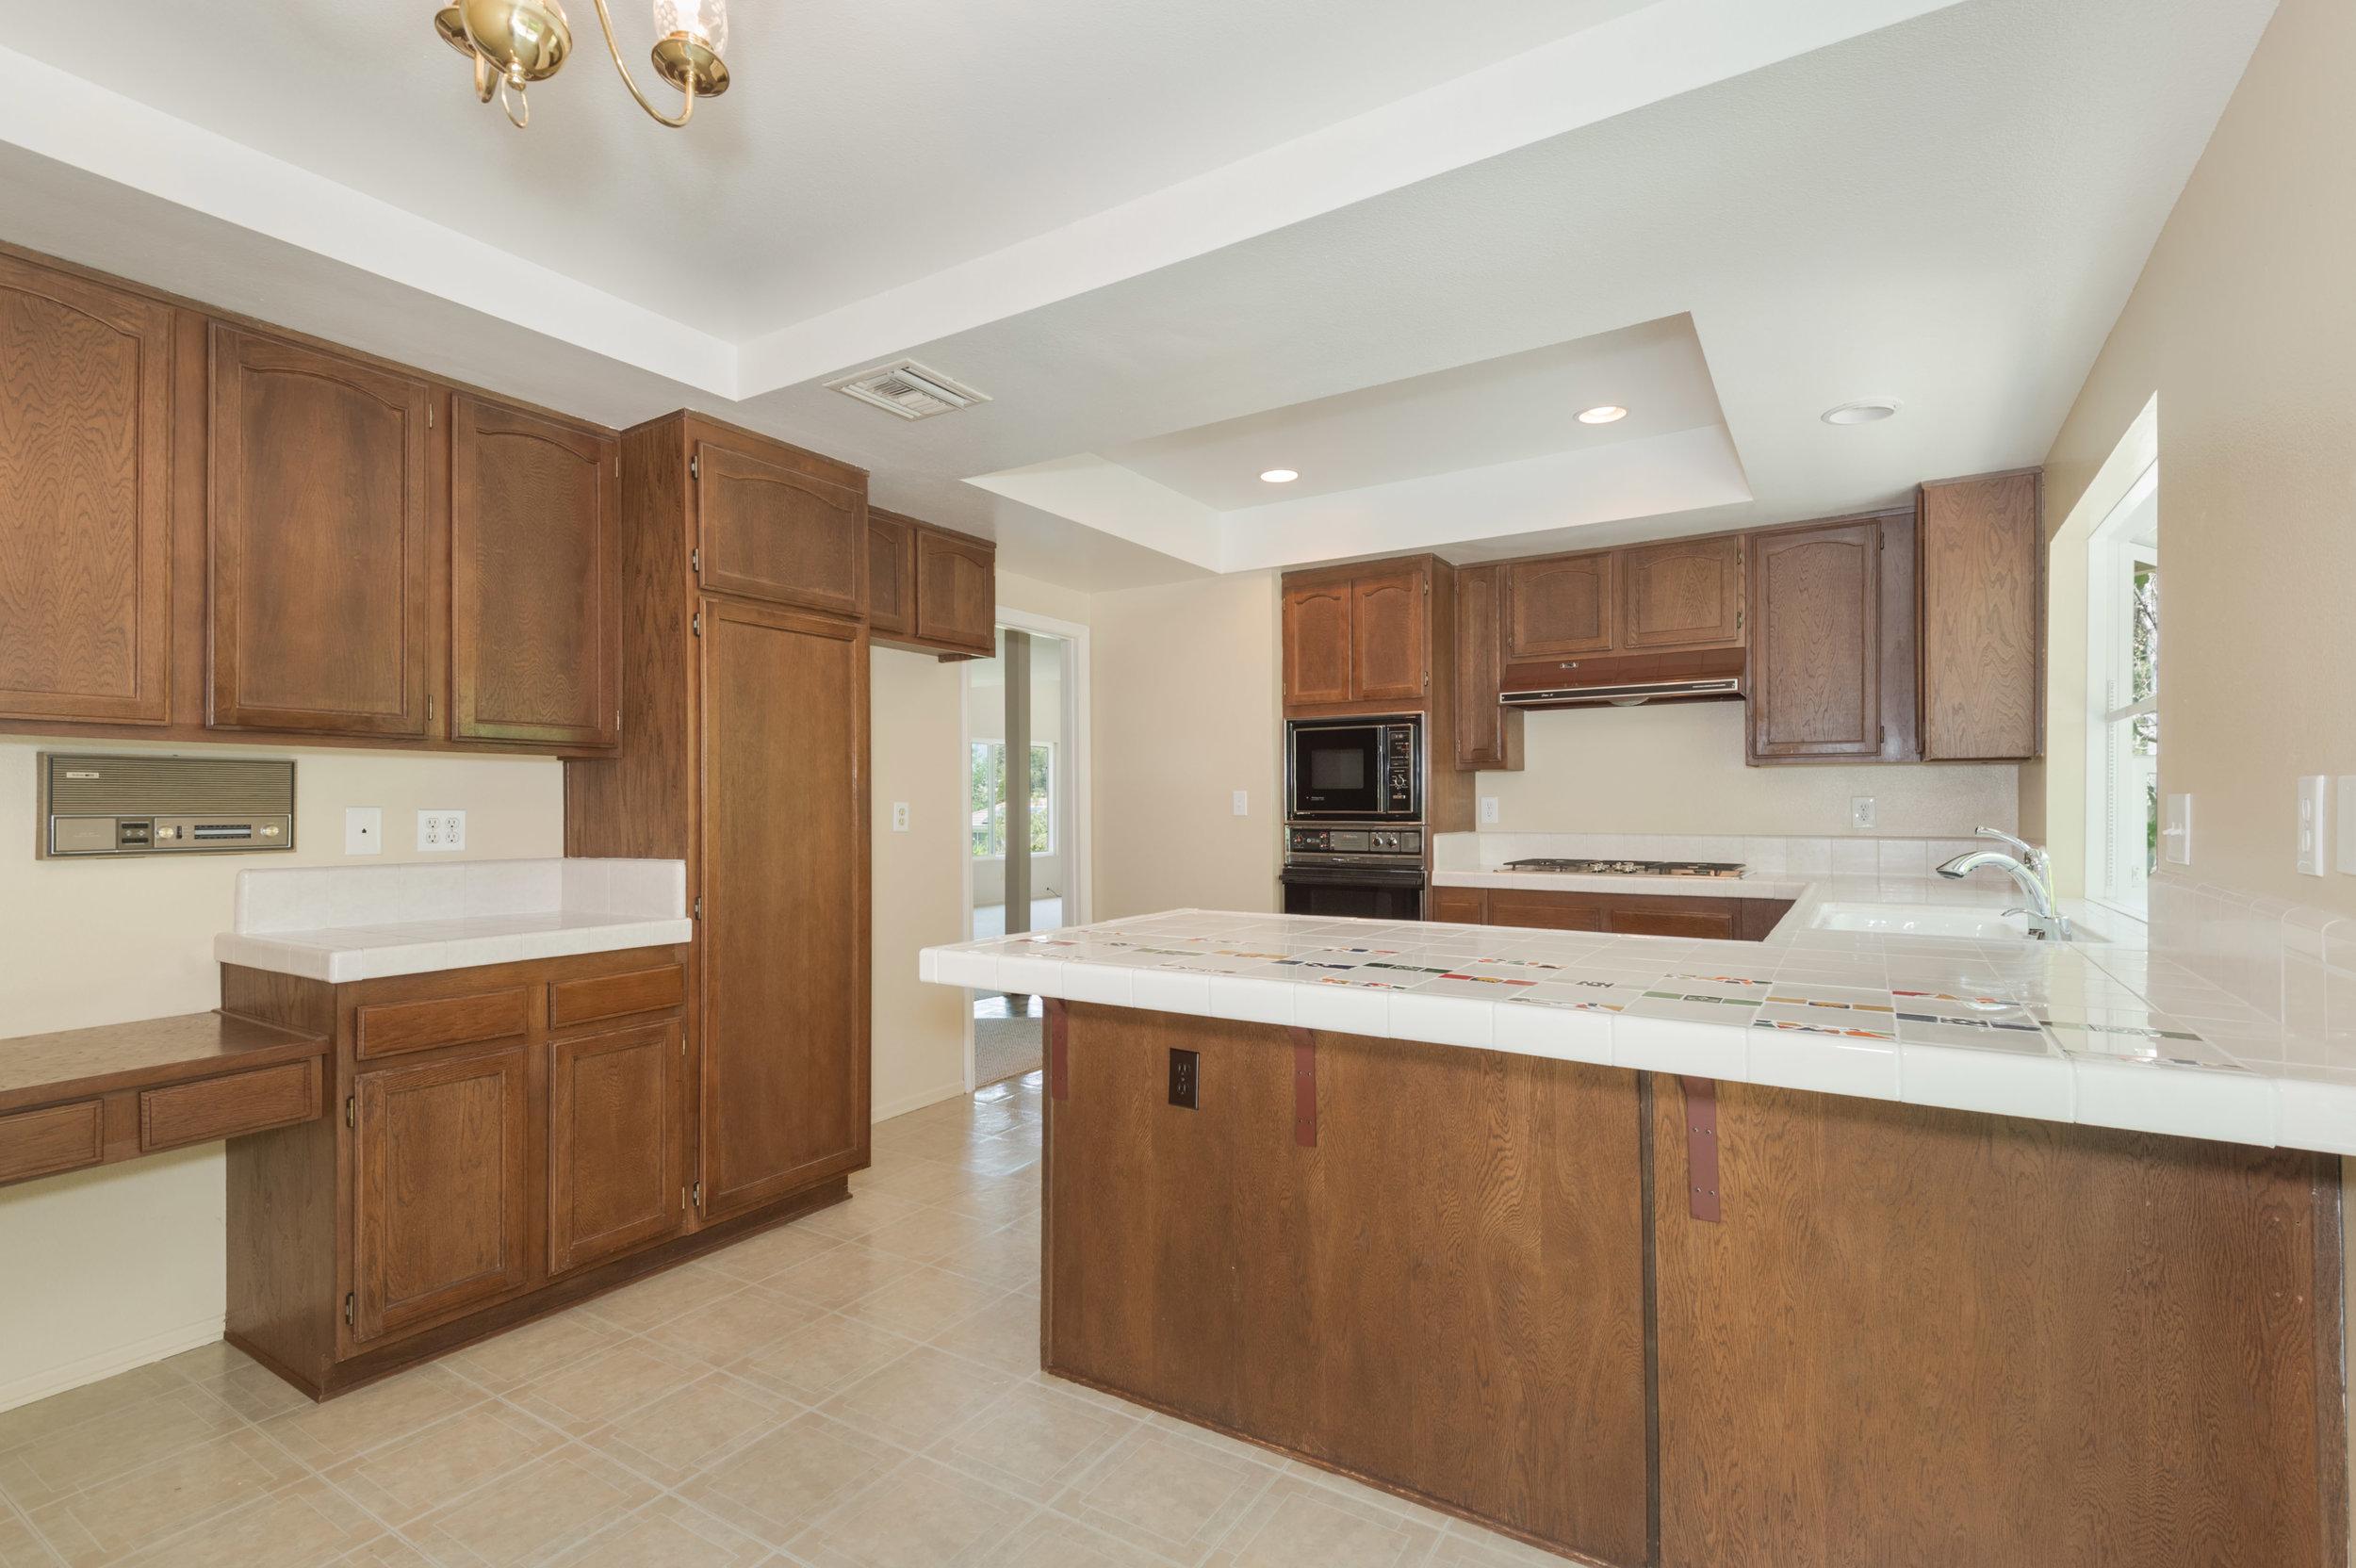 011 kitchen 8832 Moorcroft Avenue West Hills For Sale Lease The Malibu Life Team Luxury Real Estate.jpg